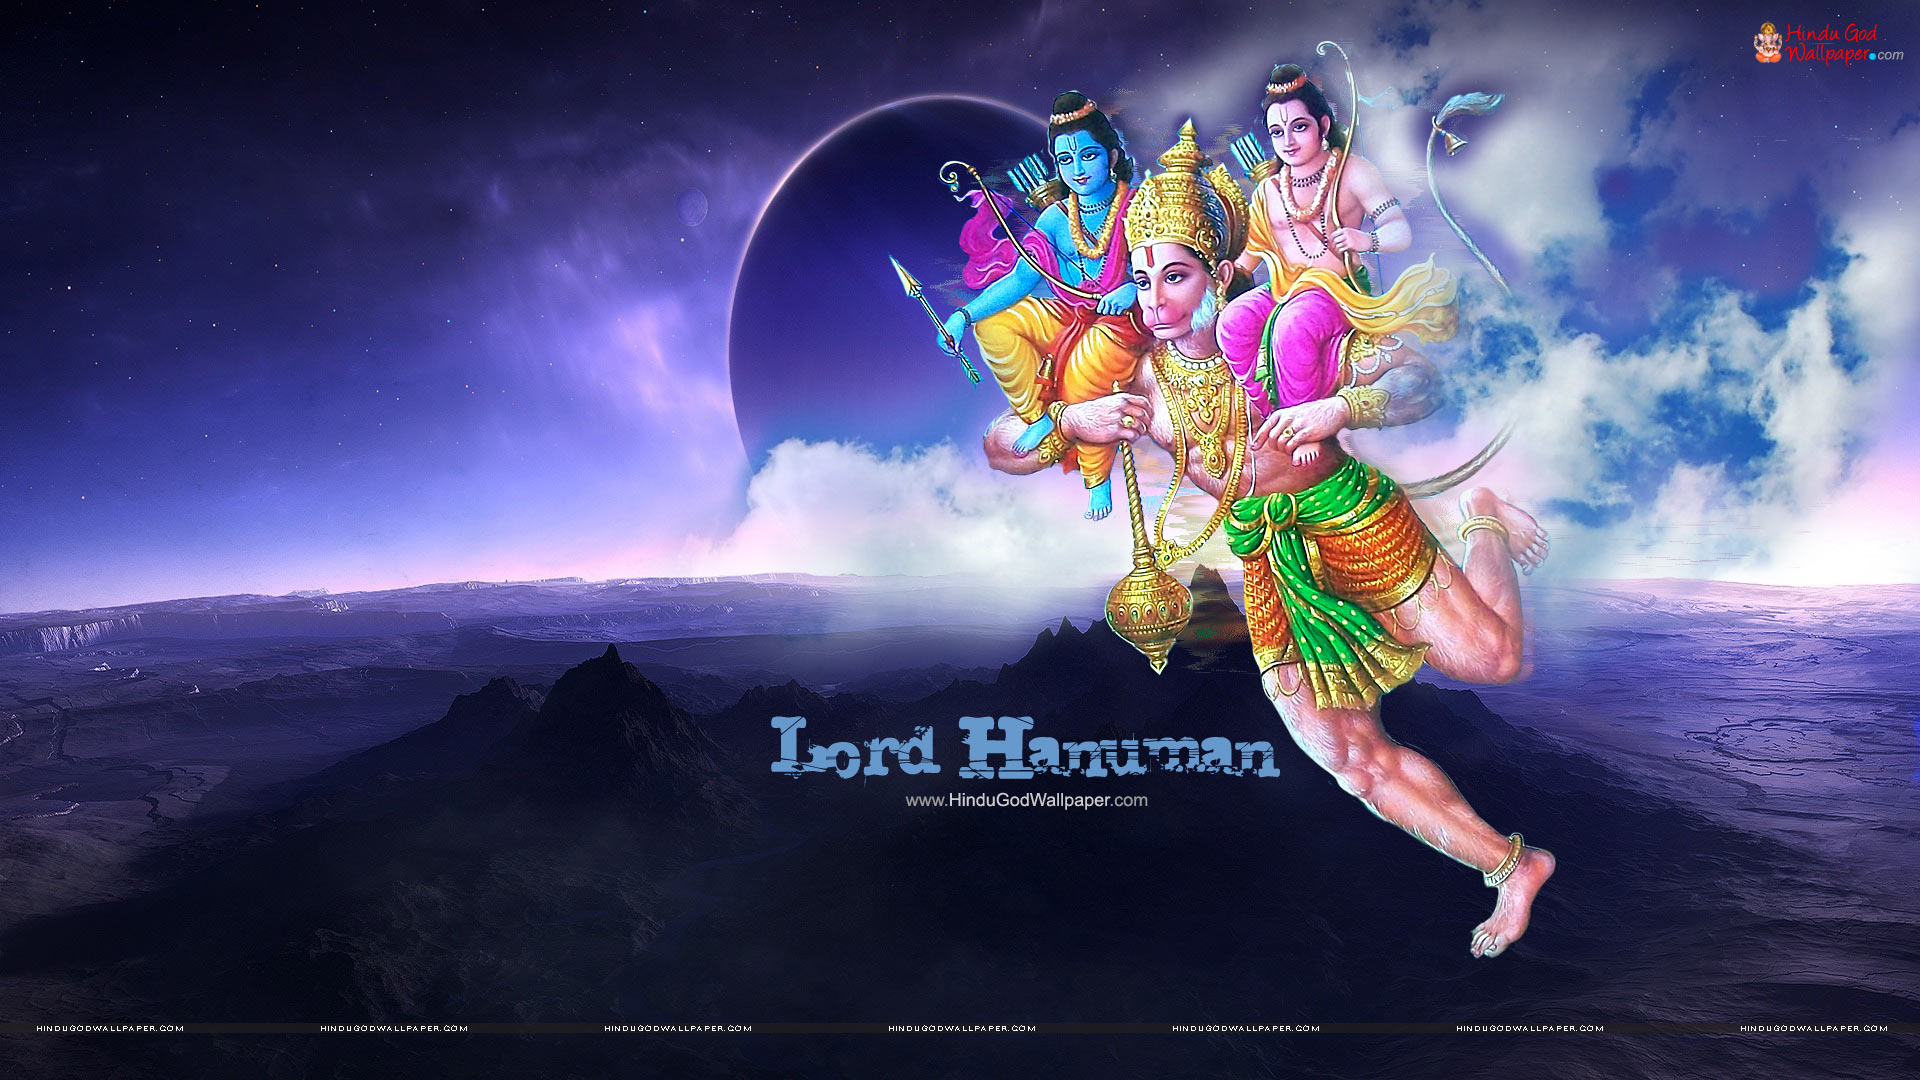 Lord Hanuman Images Hd Bajrang Bali Hanuman Photos Download